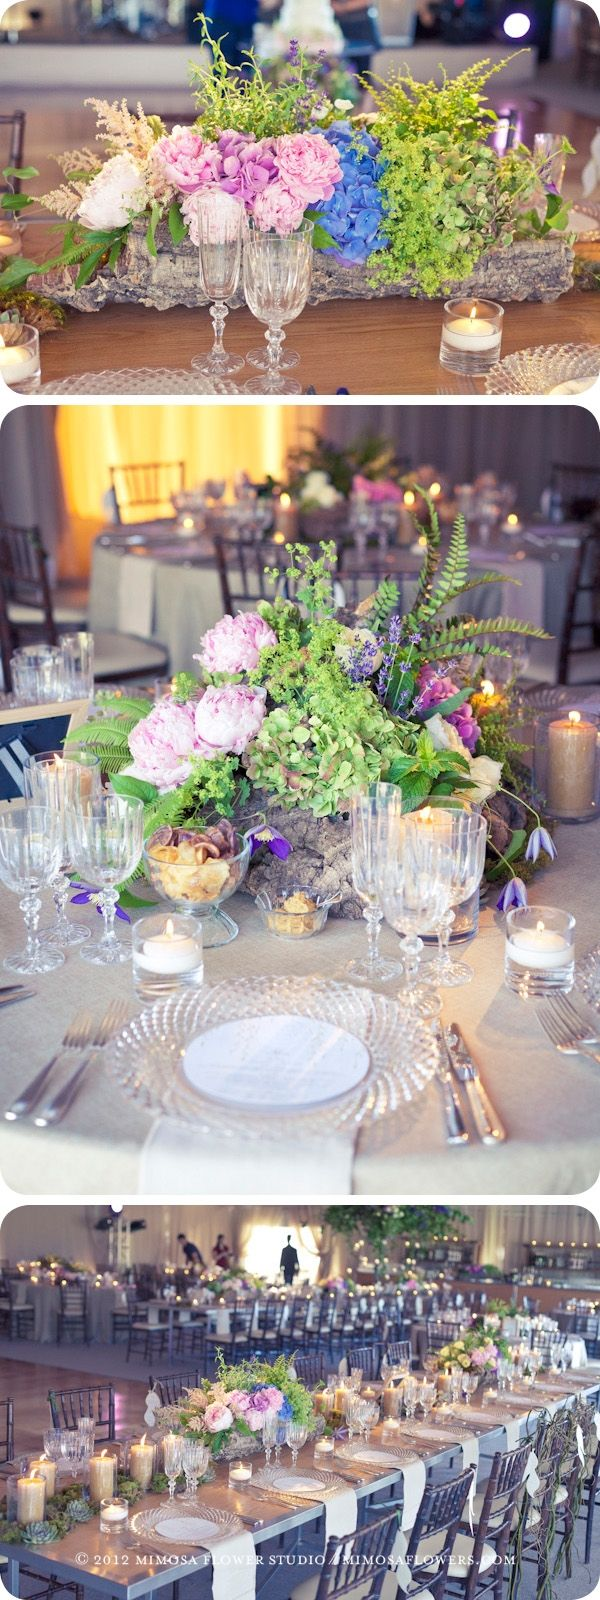 Blue Mountain private wedding - floral decor